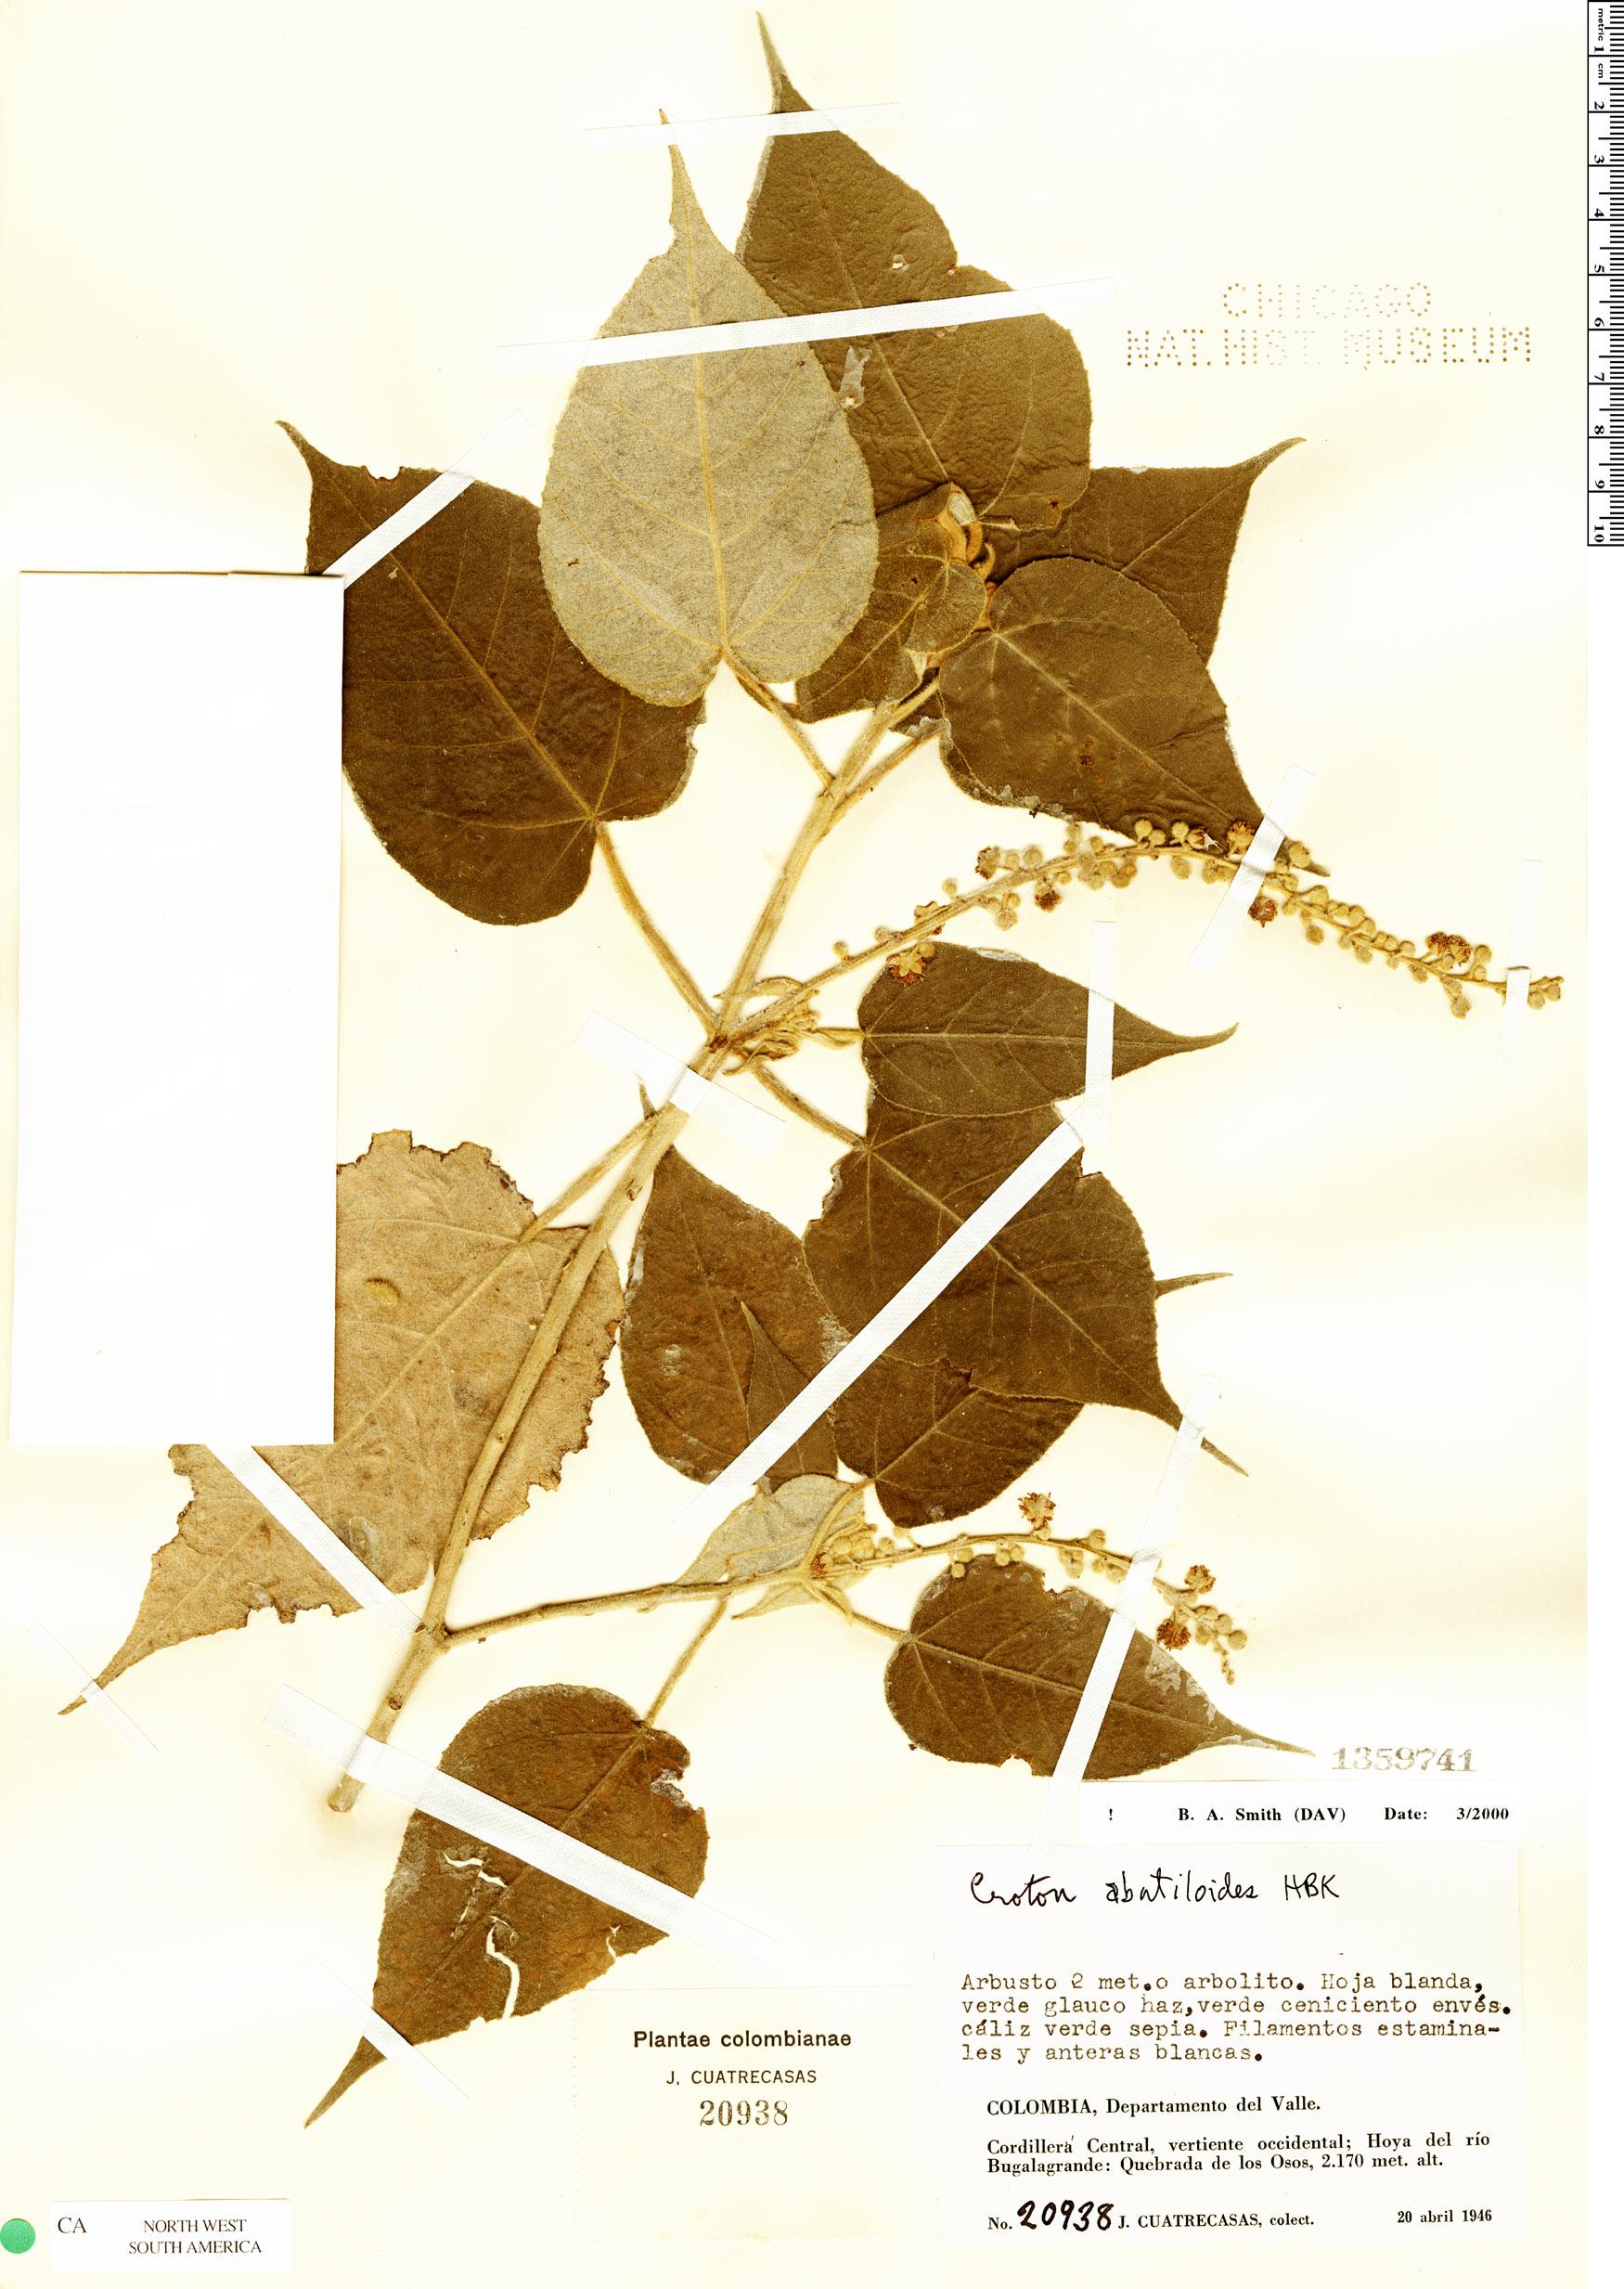 Specimen: Croton abutiloides